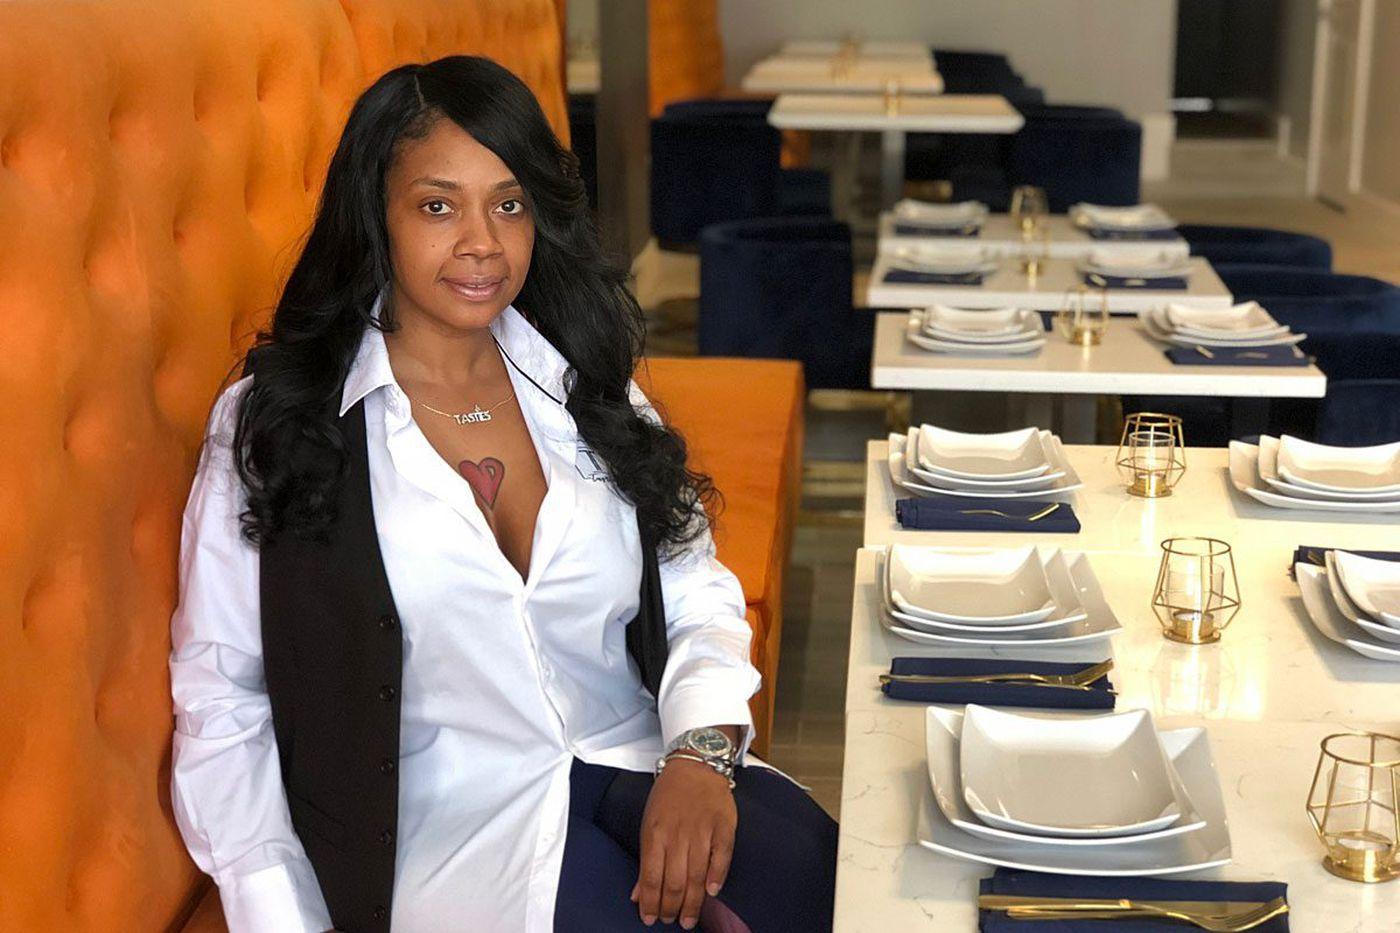 West Philadelphia needed an upscale restaurant, she says